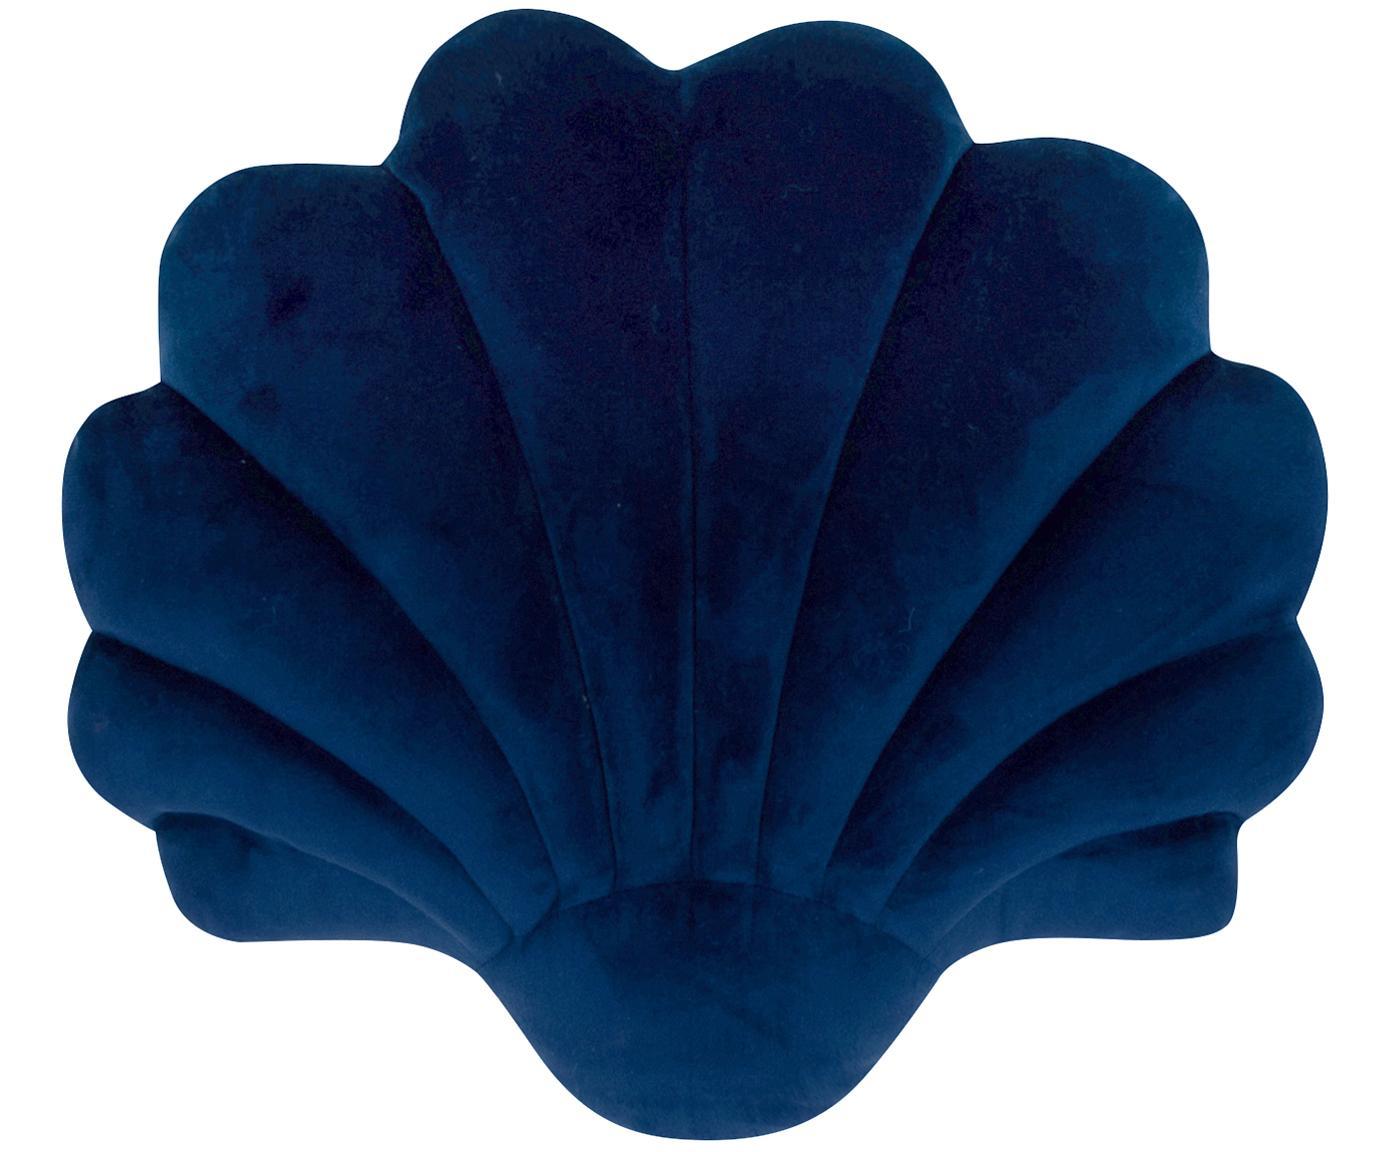 Kussen Shell, Donkerblauw, 28 x 30 cm